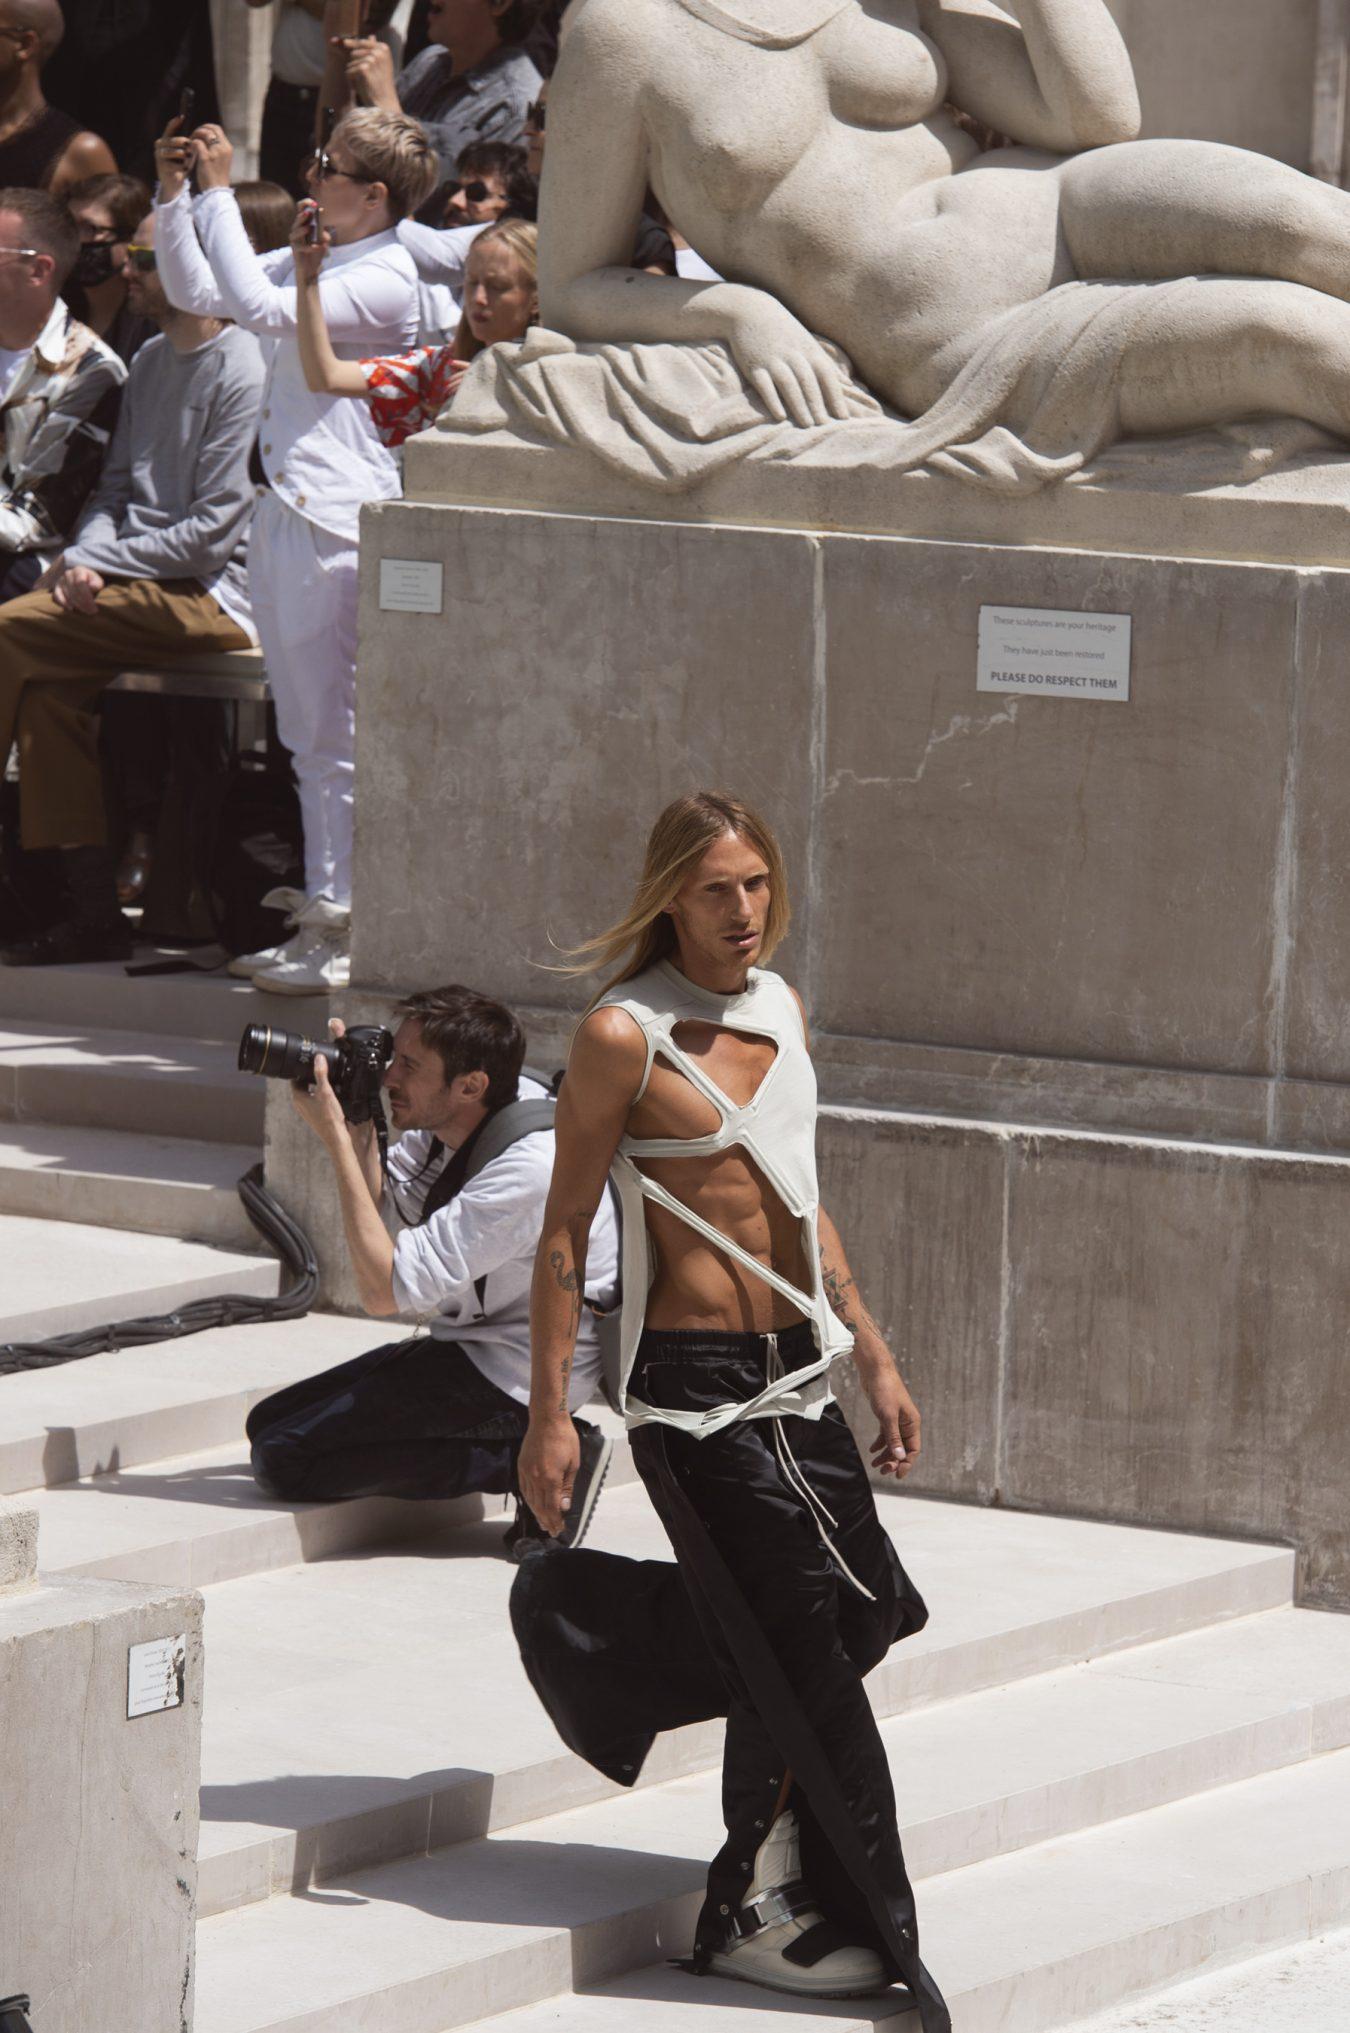 fashion shows eyewitness account